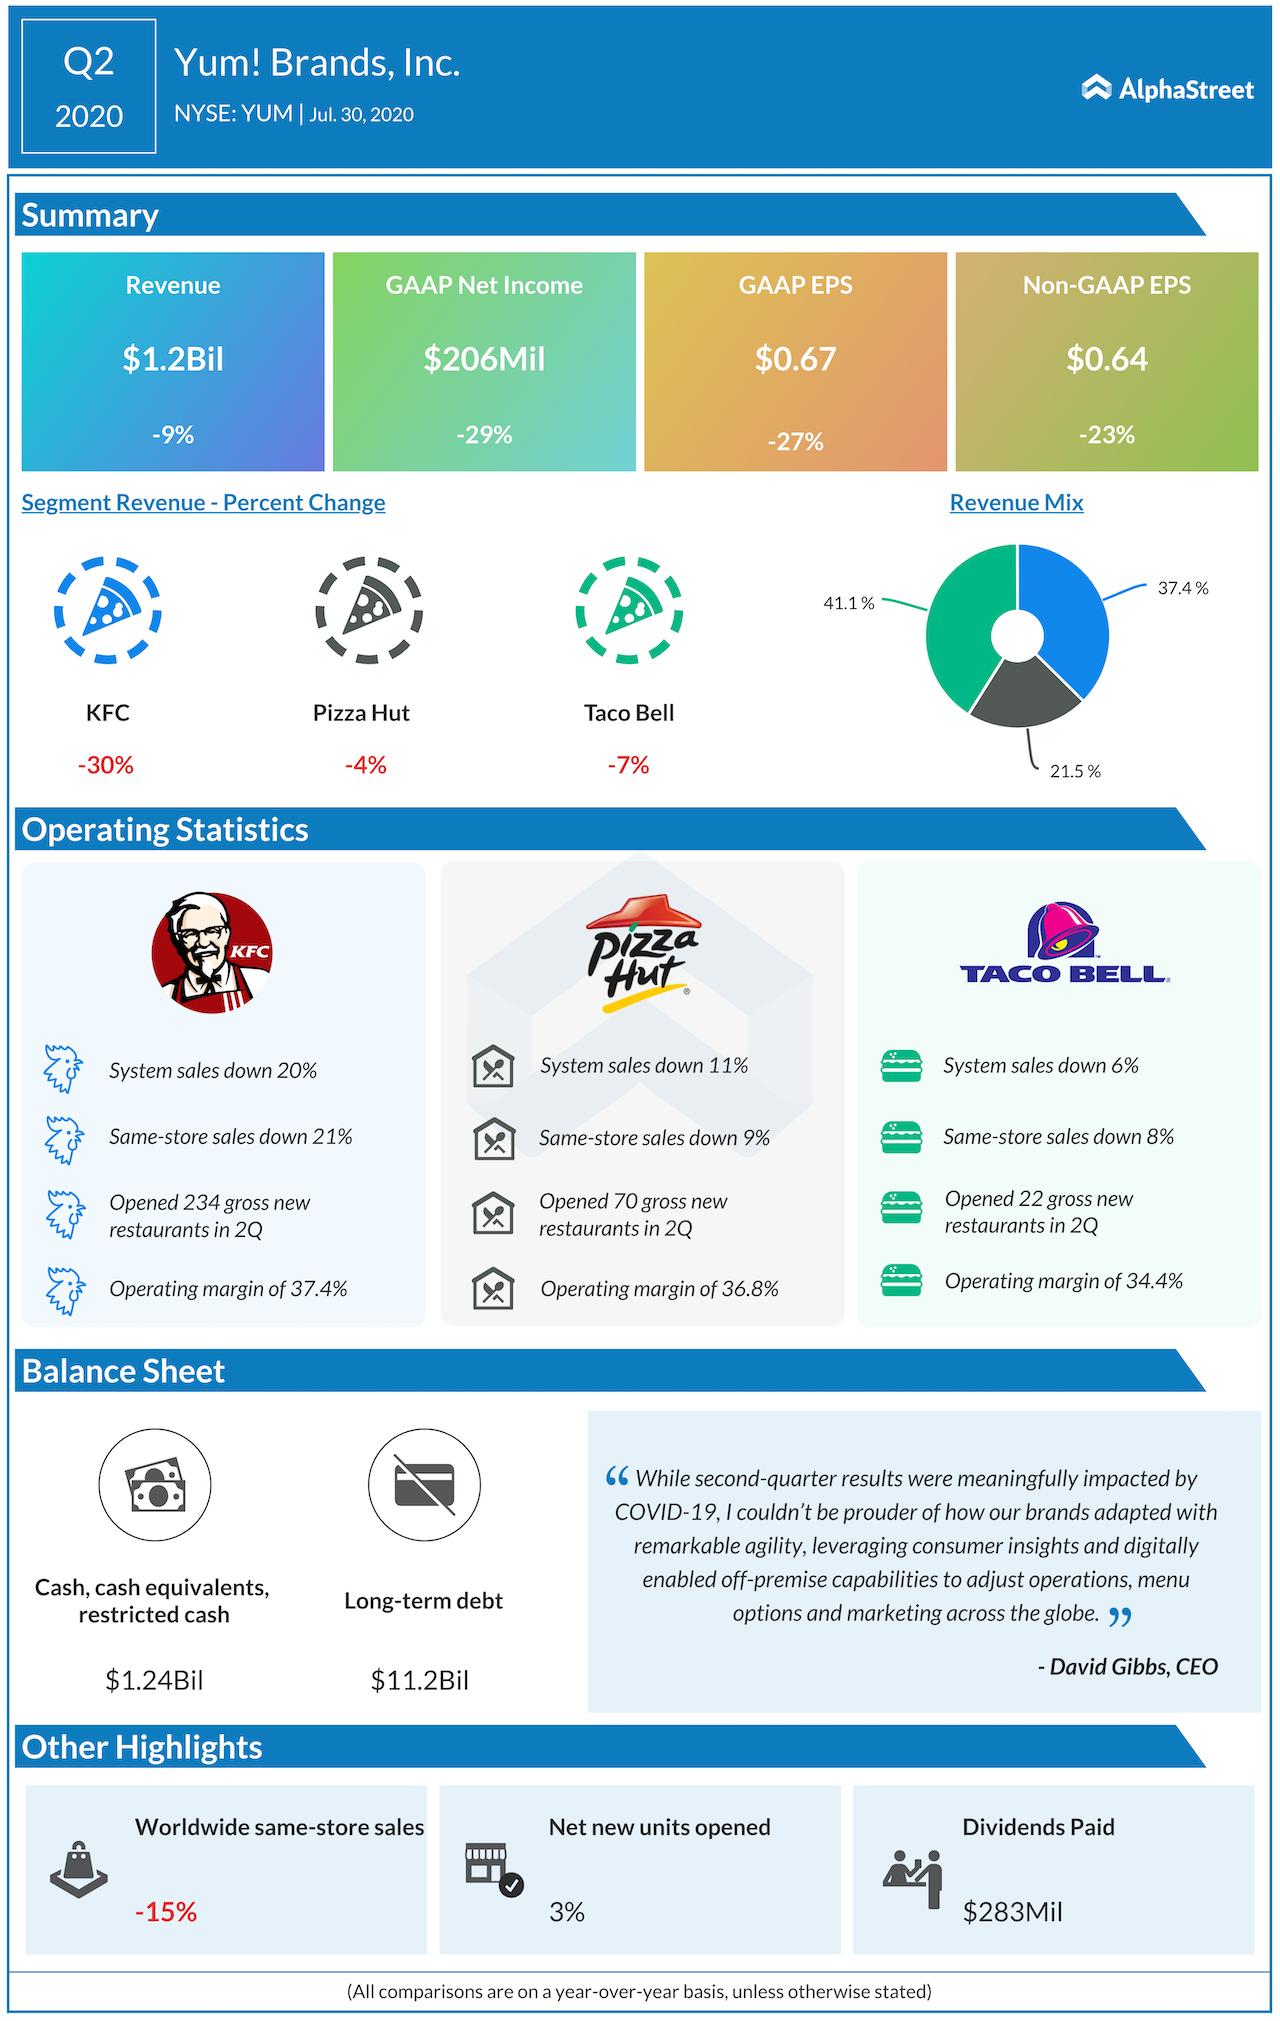 Yum Brands Q2 2020 earnings